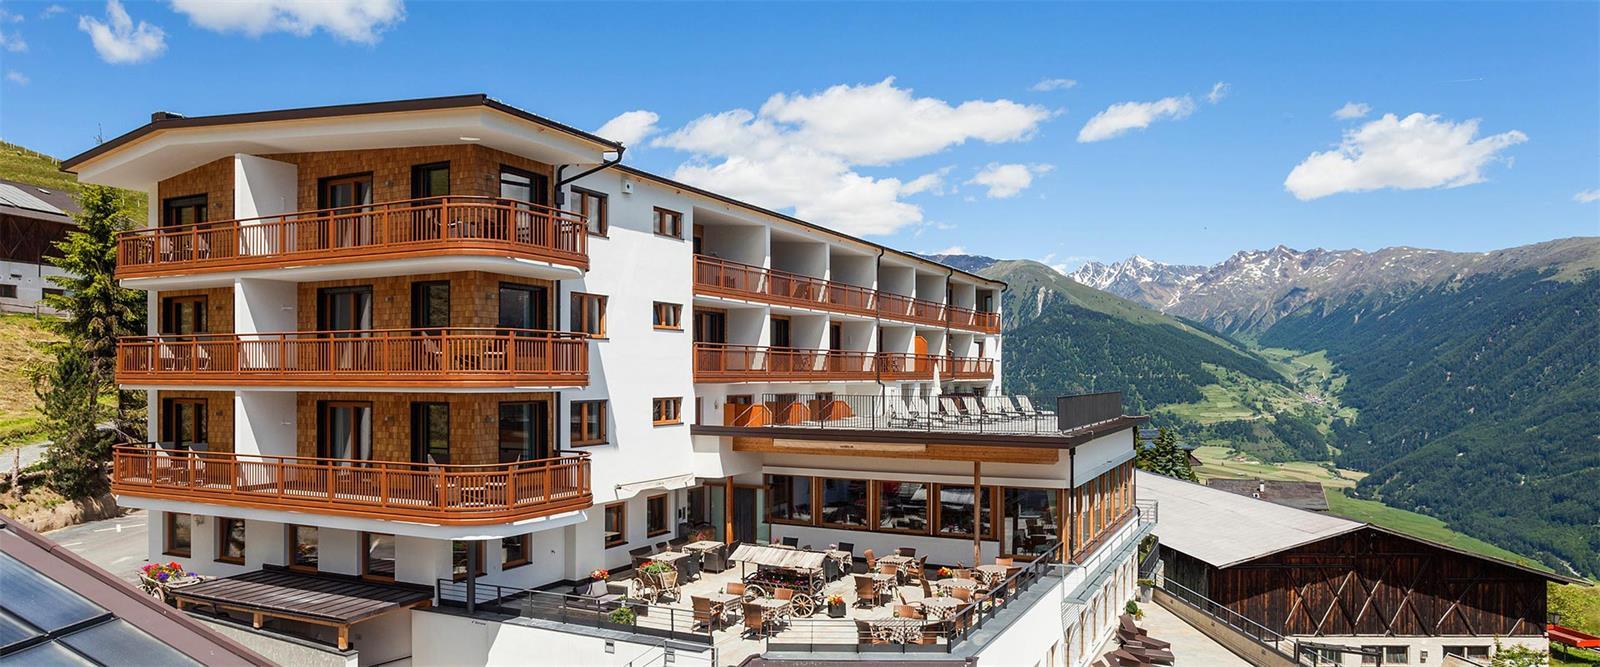 Winter Wellness Hotel Italienisch